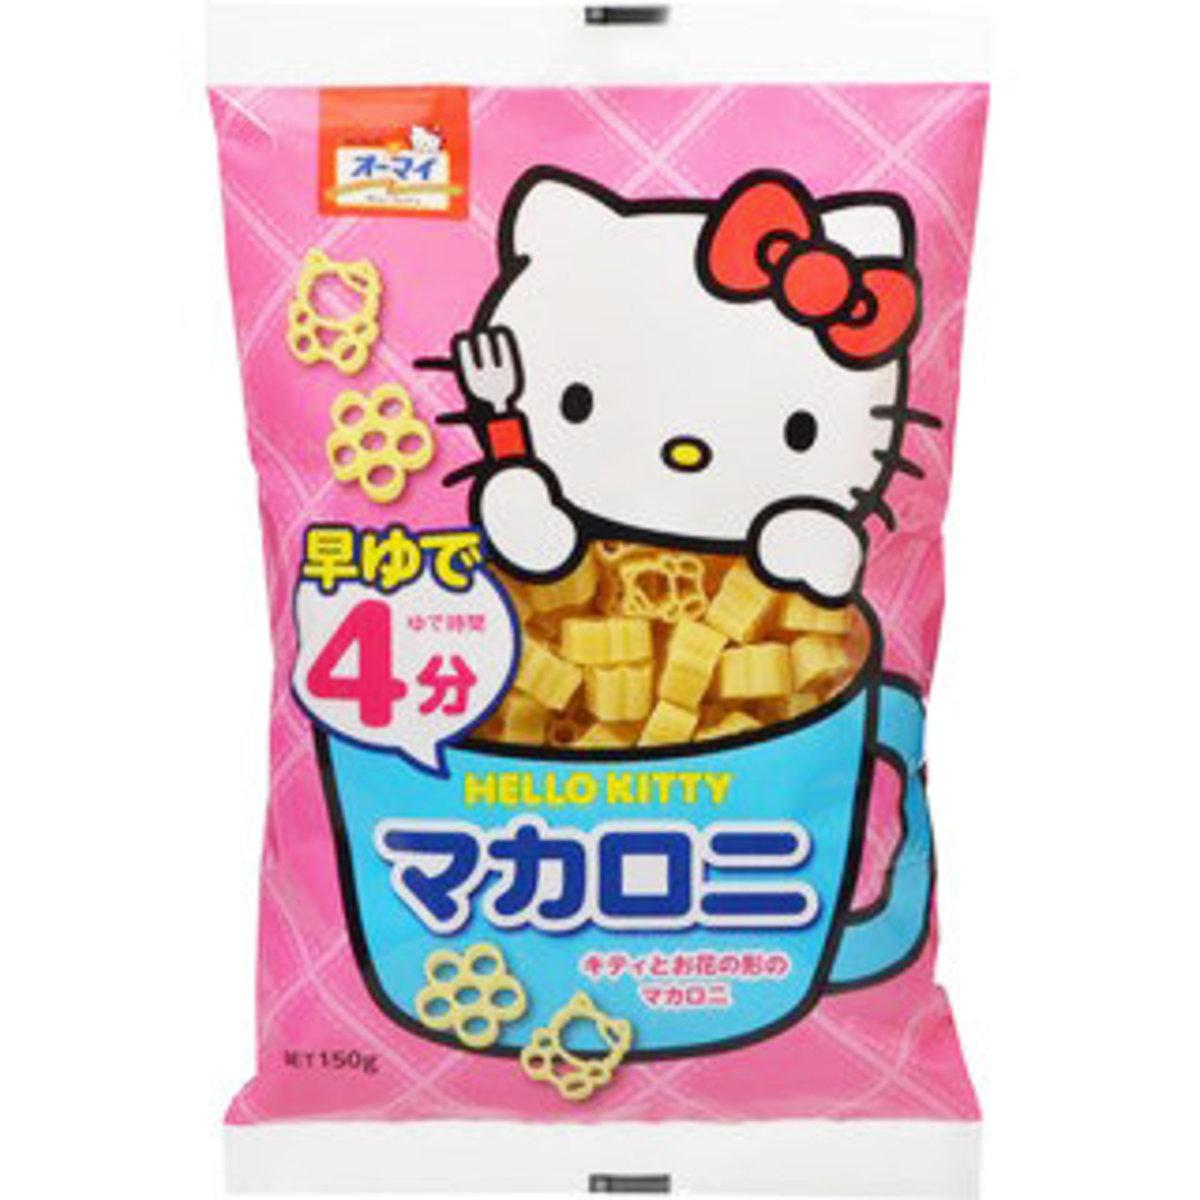 Hello Kitty Macaroni 150g (Parallel Imports Product)